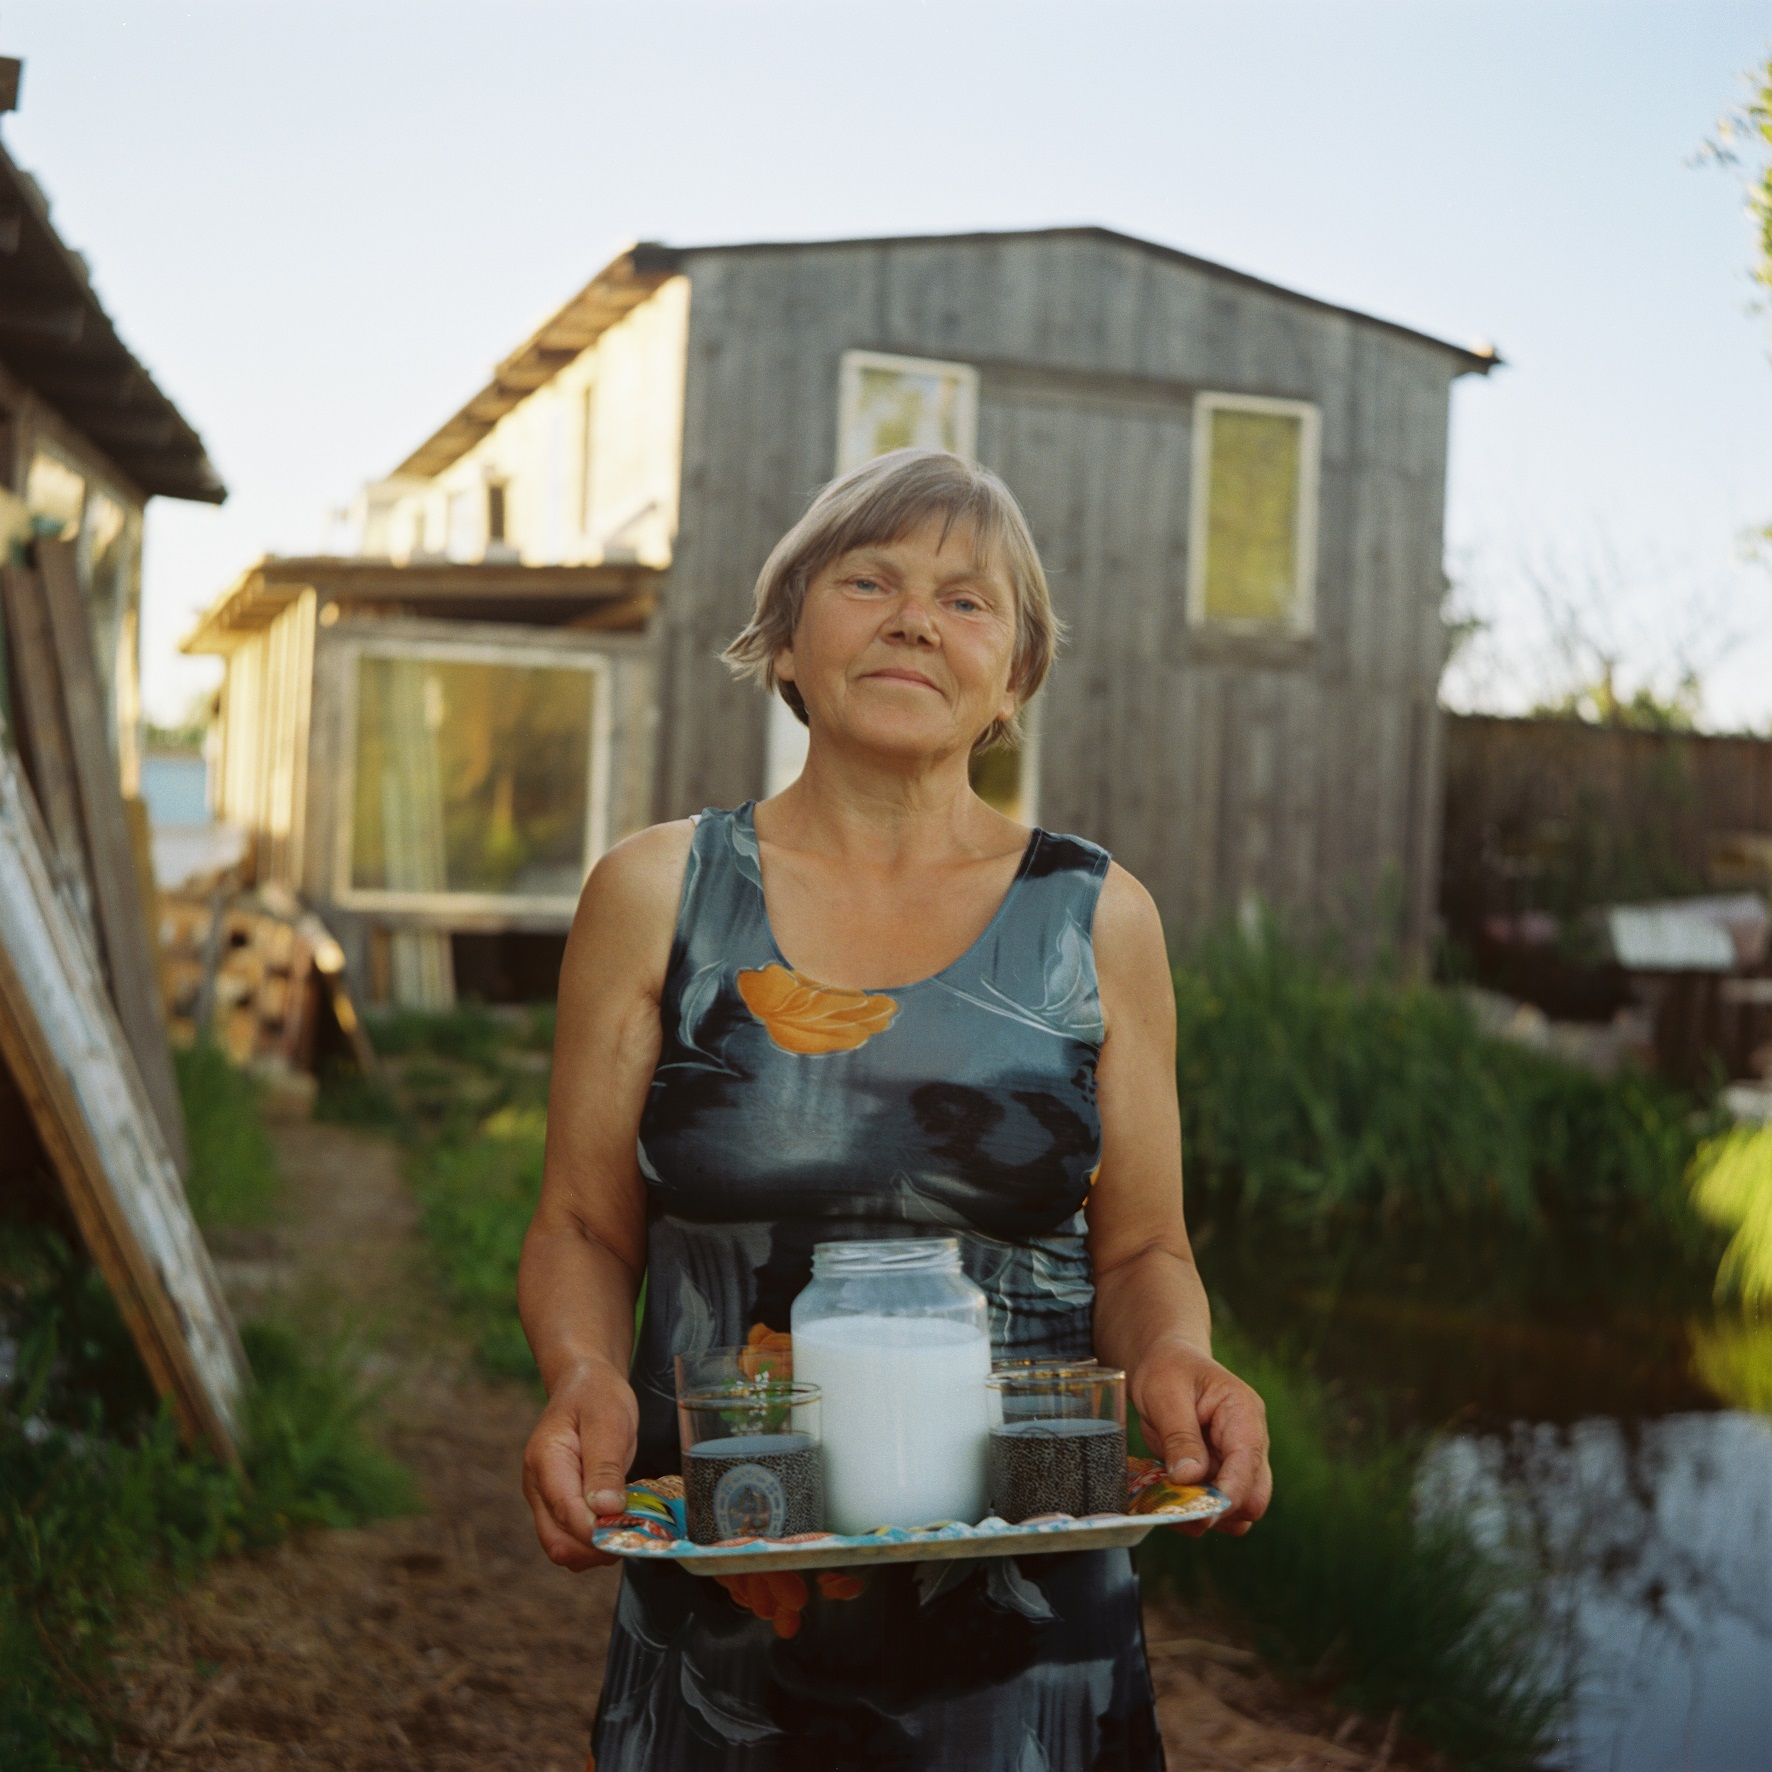 Svetlana, 29.06.2011